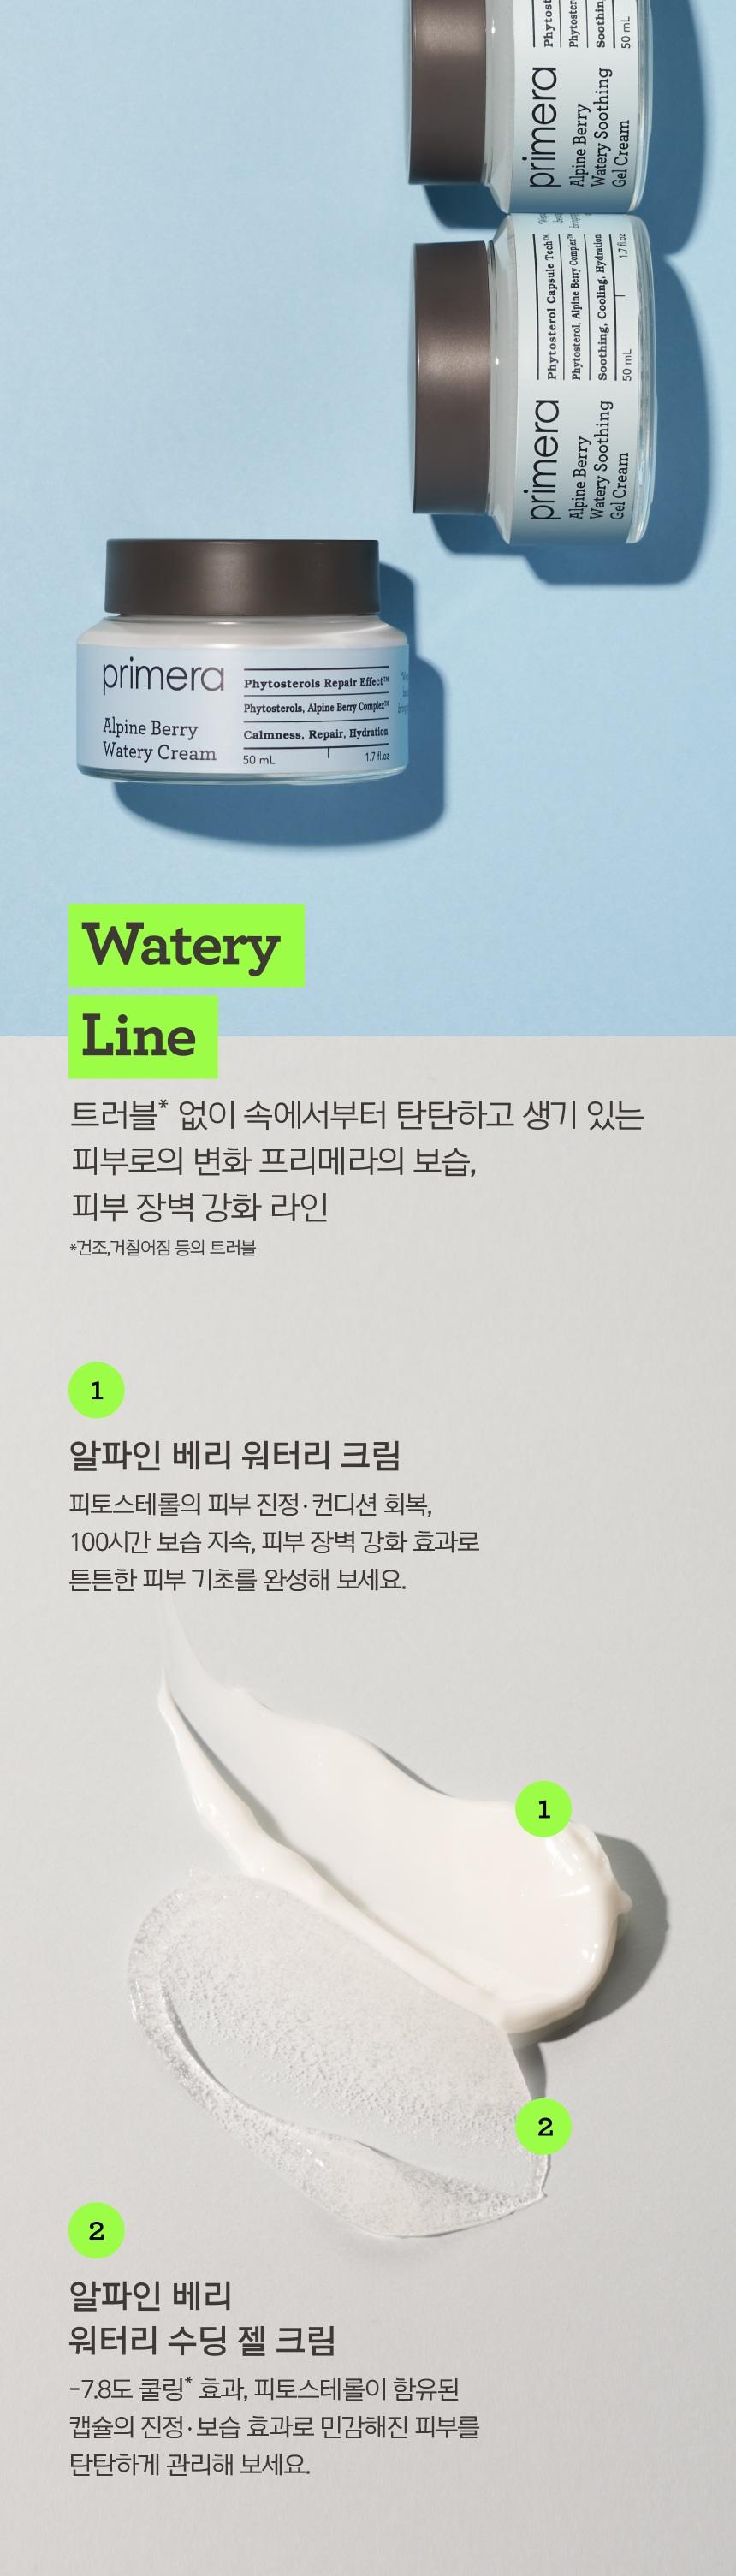 primera Alpine Berry Watery Soothing Gel Cream korean skincare prduct online shop malaysia sweden macau6